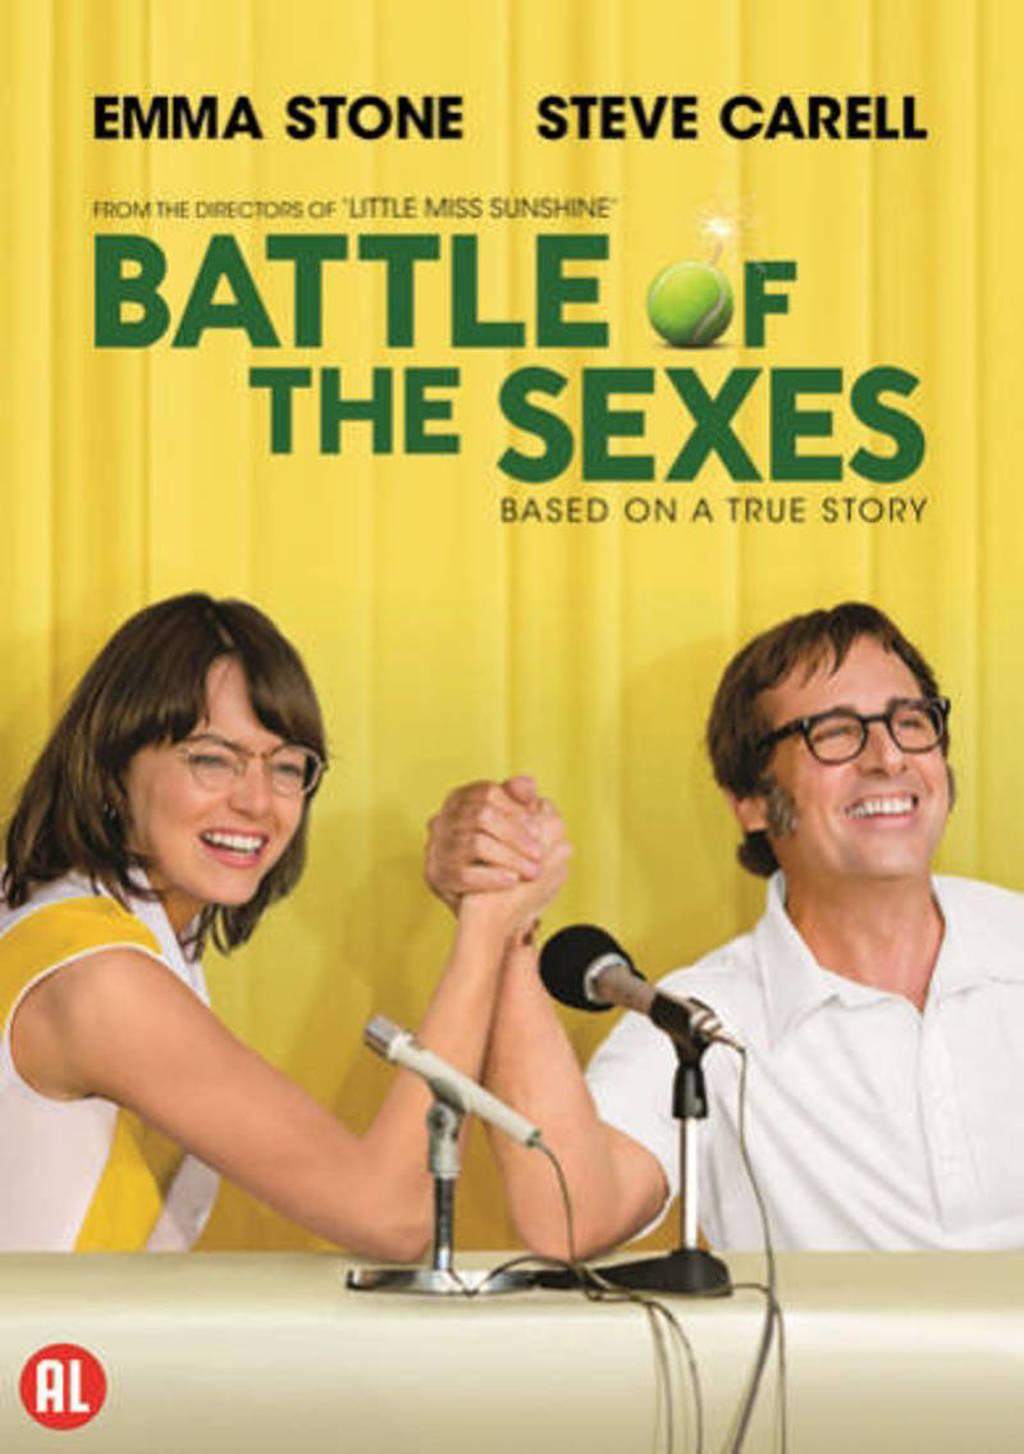 Battle of the sexes (DVD)